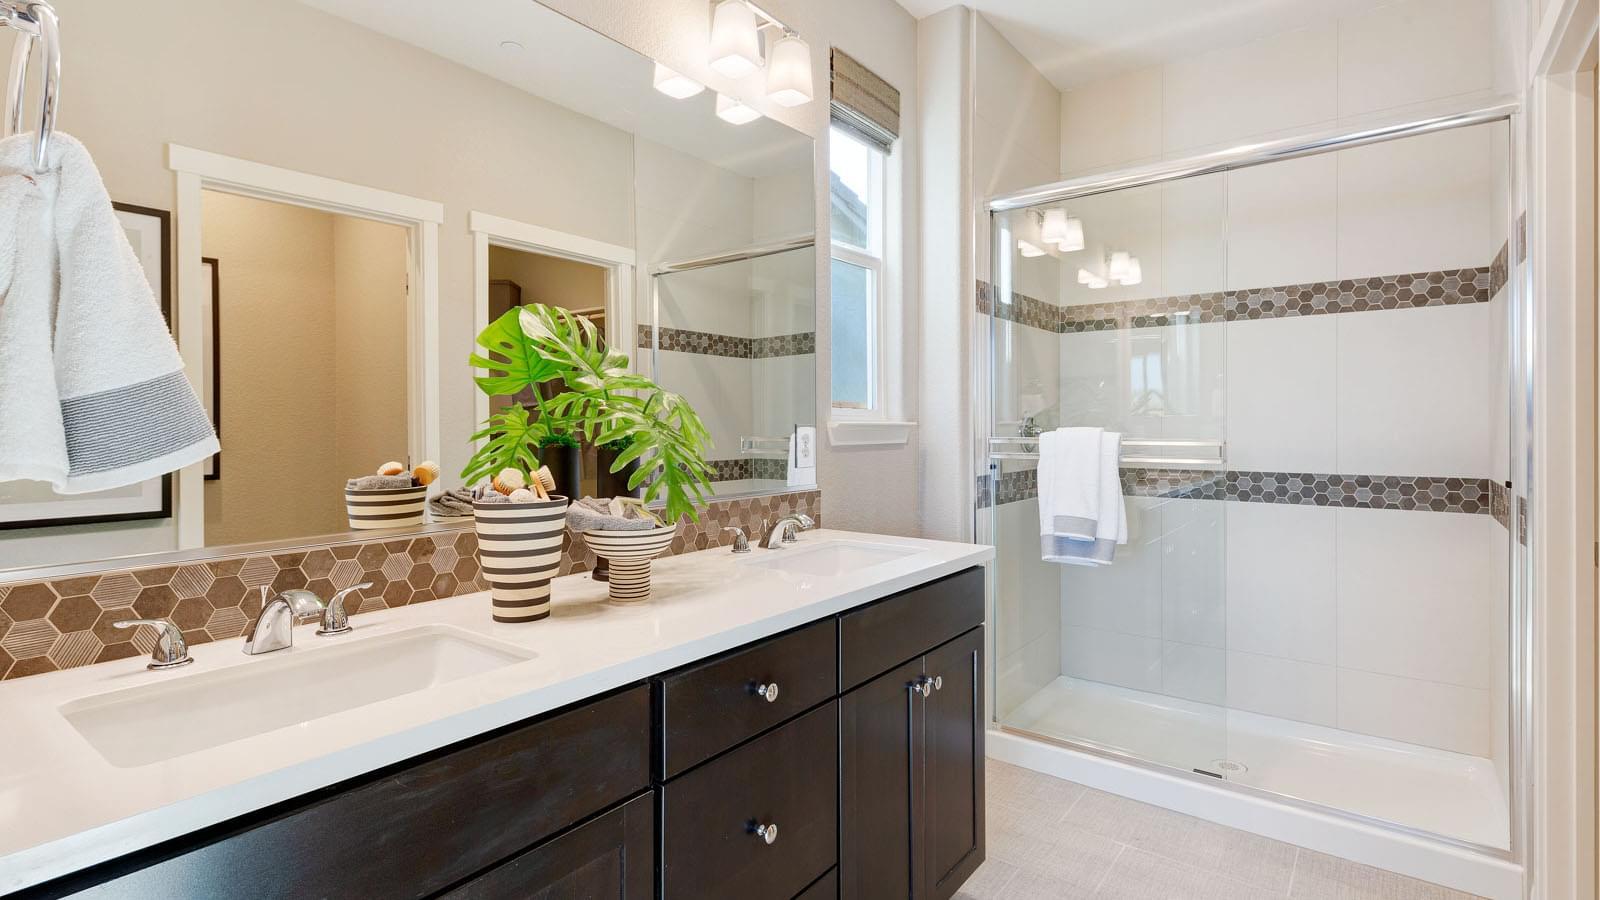 Residence 1 Owner's Bath